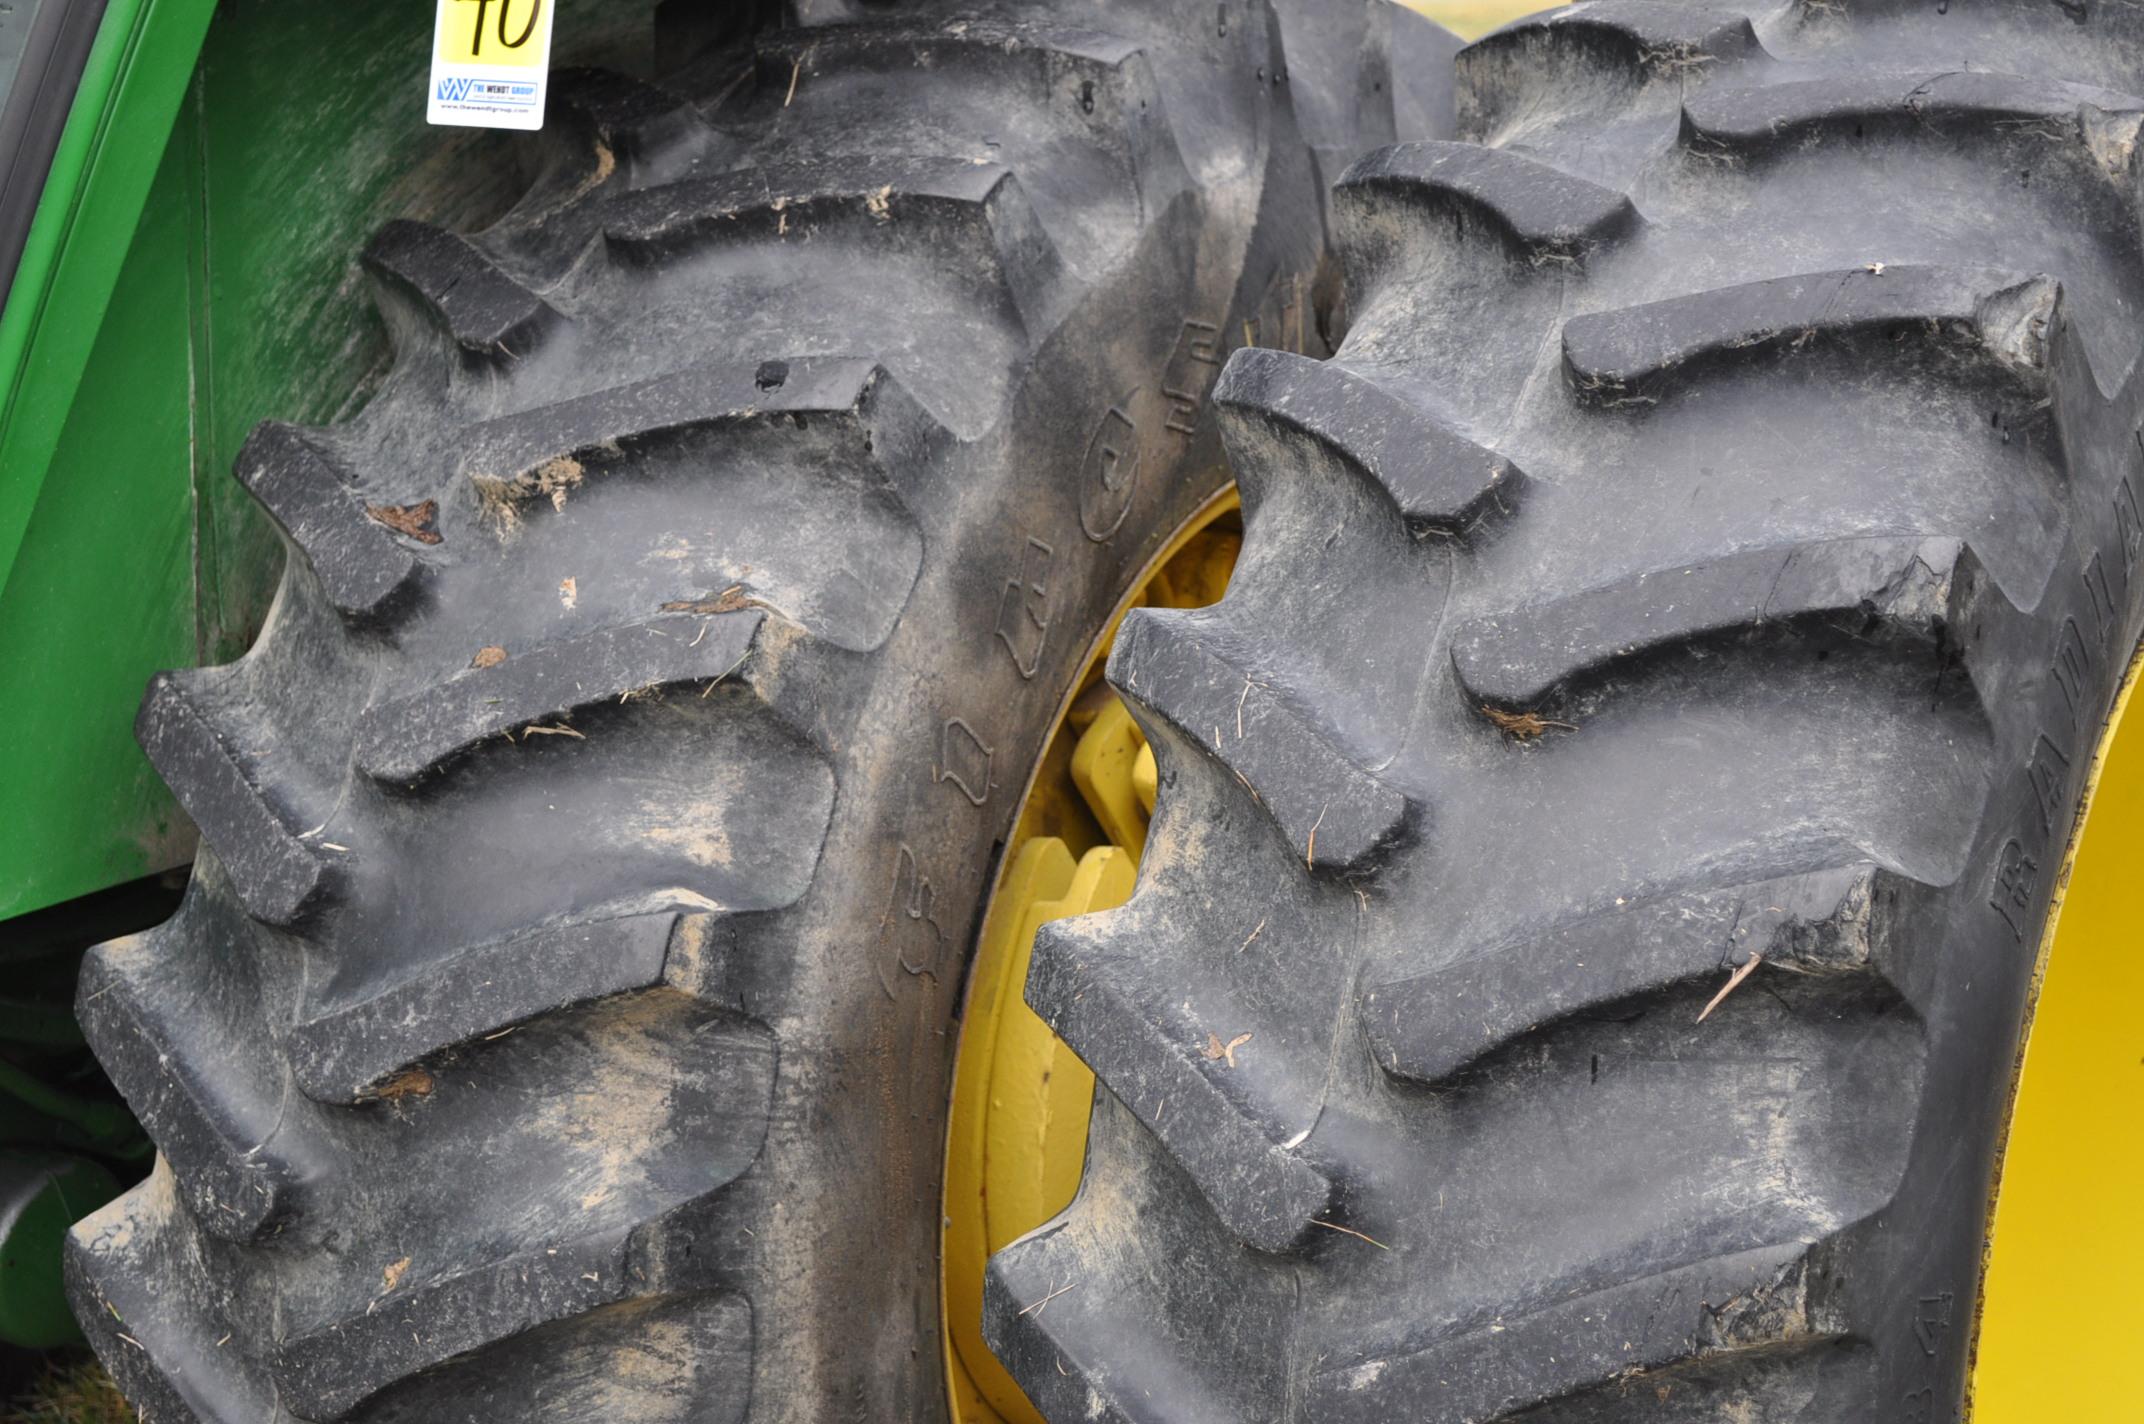 John Deere 4230 tractor, diesel, 18.4-34 hub duals, 10.00-16 front, CHA, Quad range, 2 hyd - Image 6 of 23